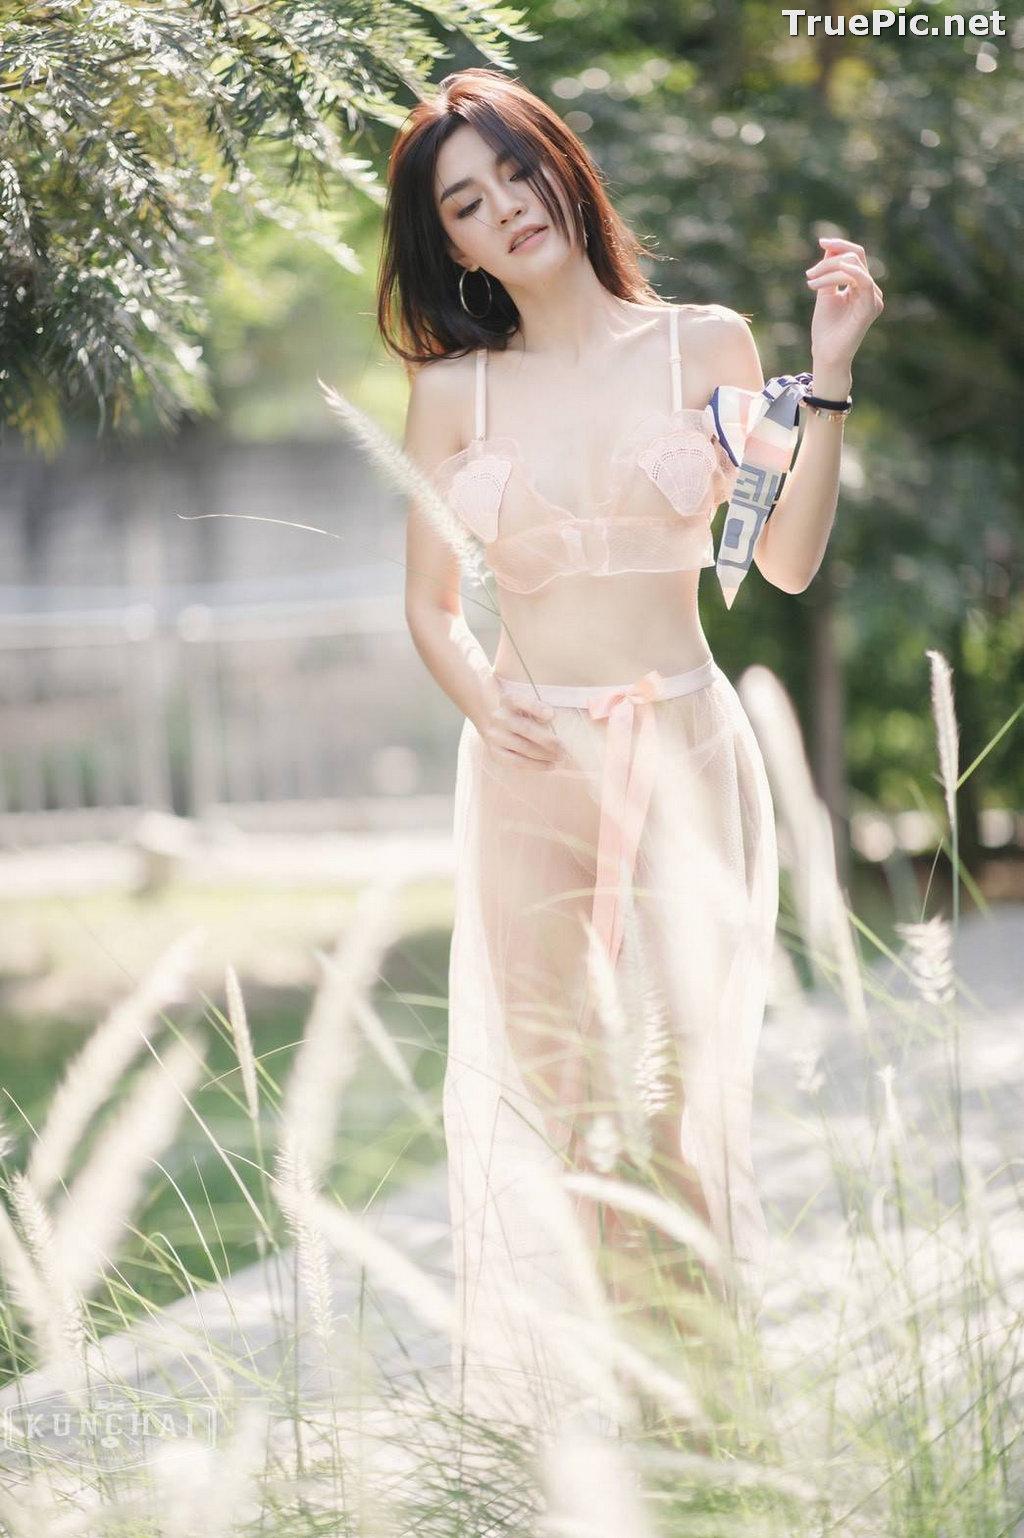 Image Thailand Model - ลฎาภา รัชตะอมรโชติ - Pink Transparent Lingerie - TruePic.net - Picture-6